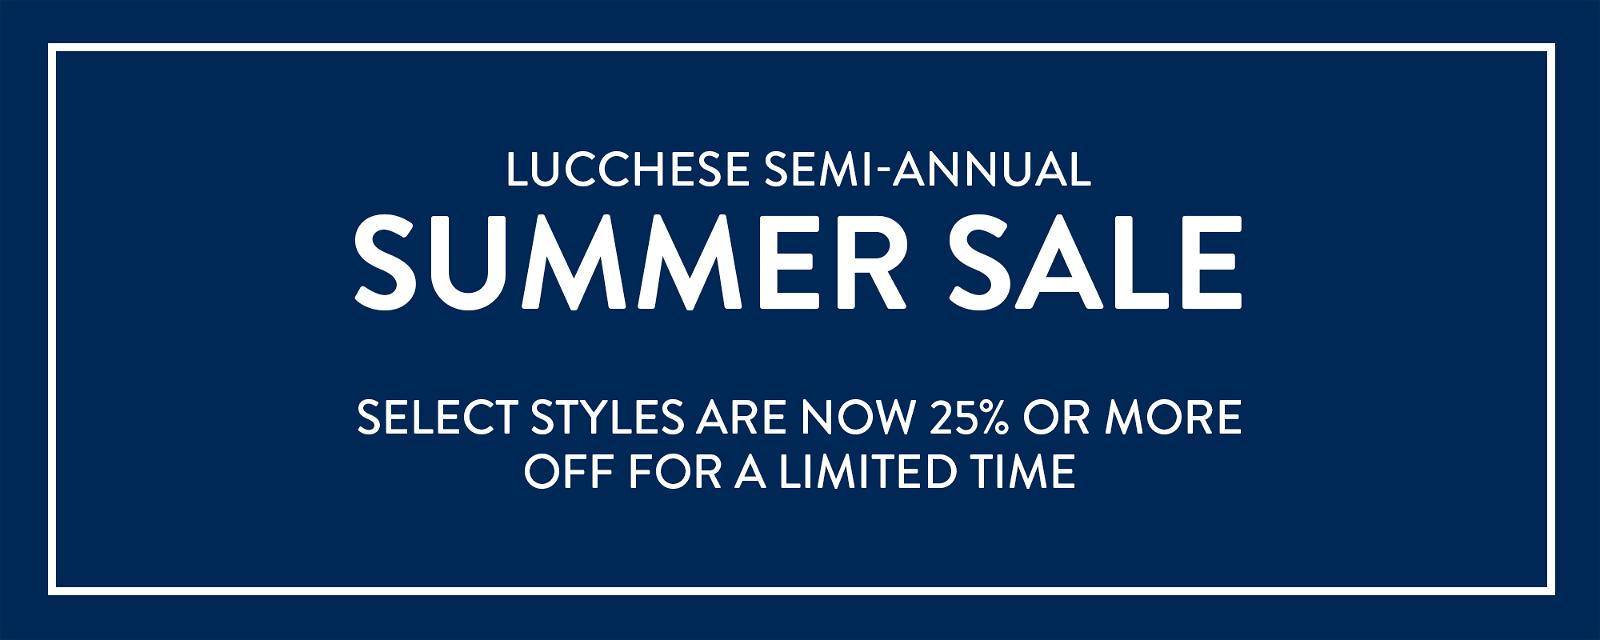 Semi-Annual Summer Sale